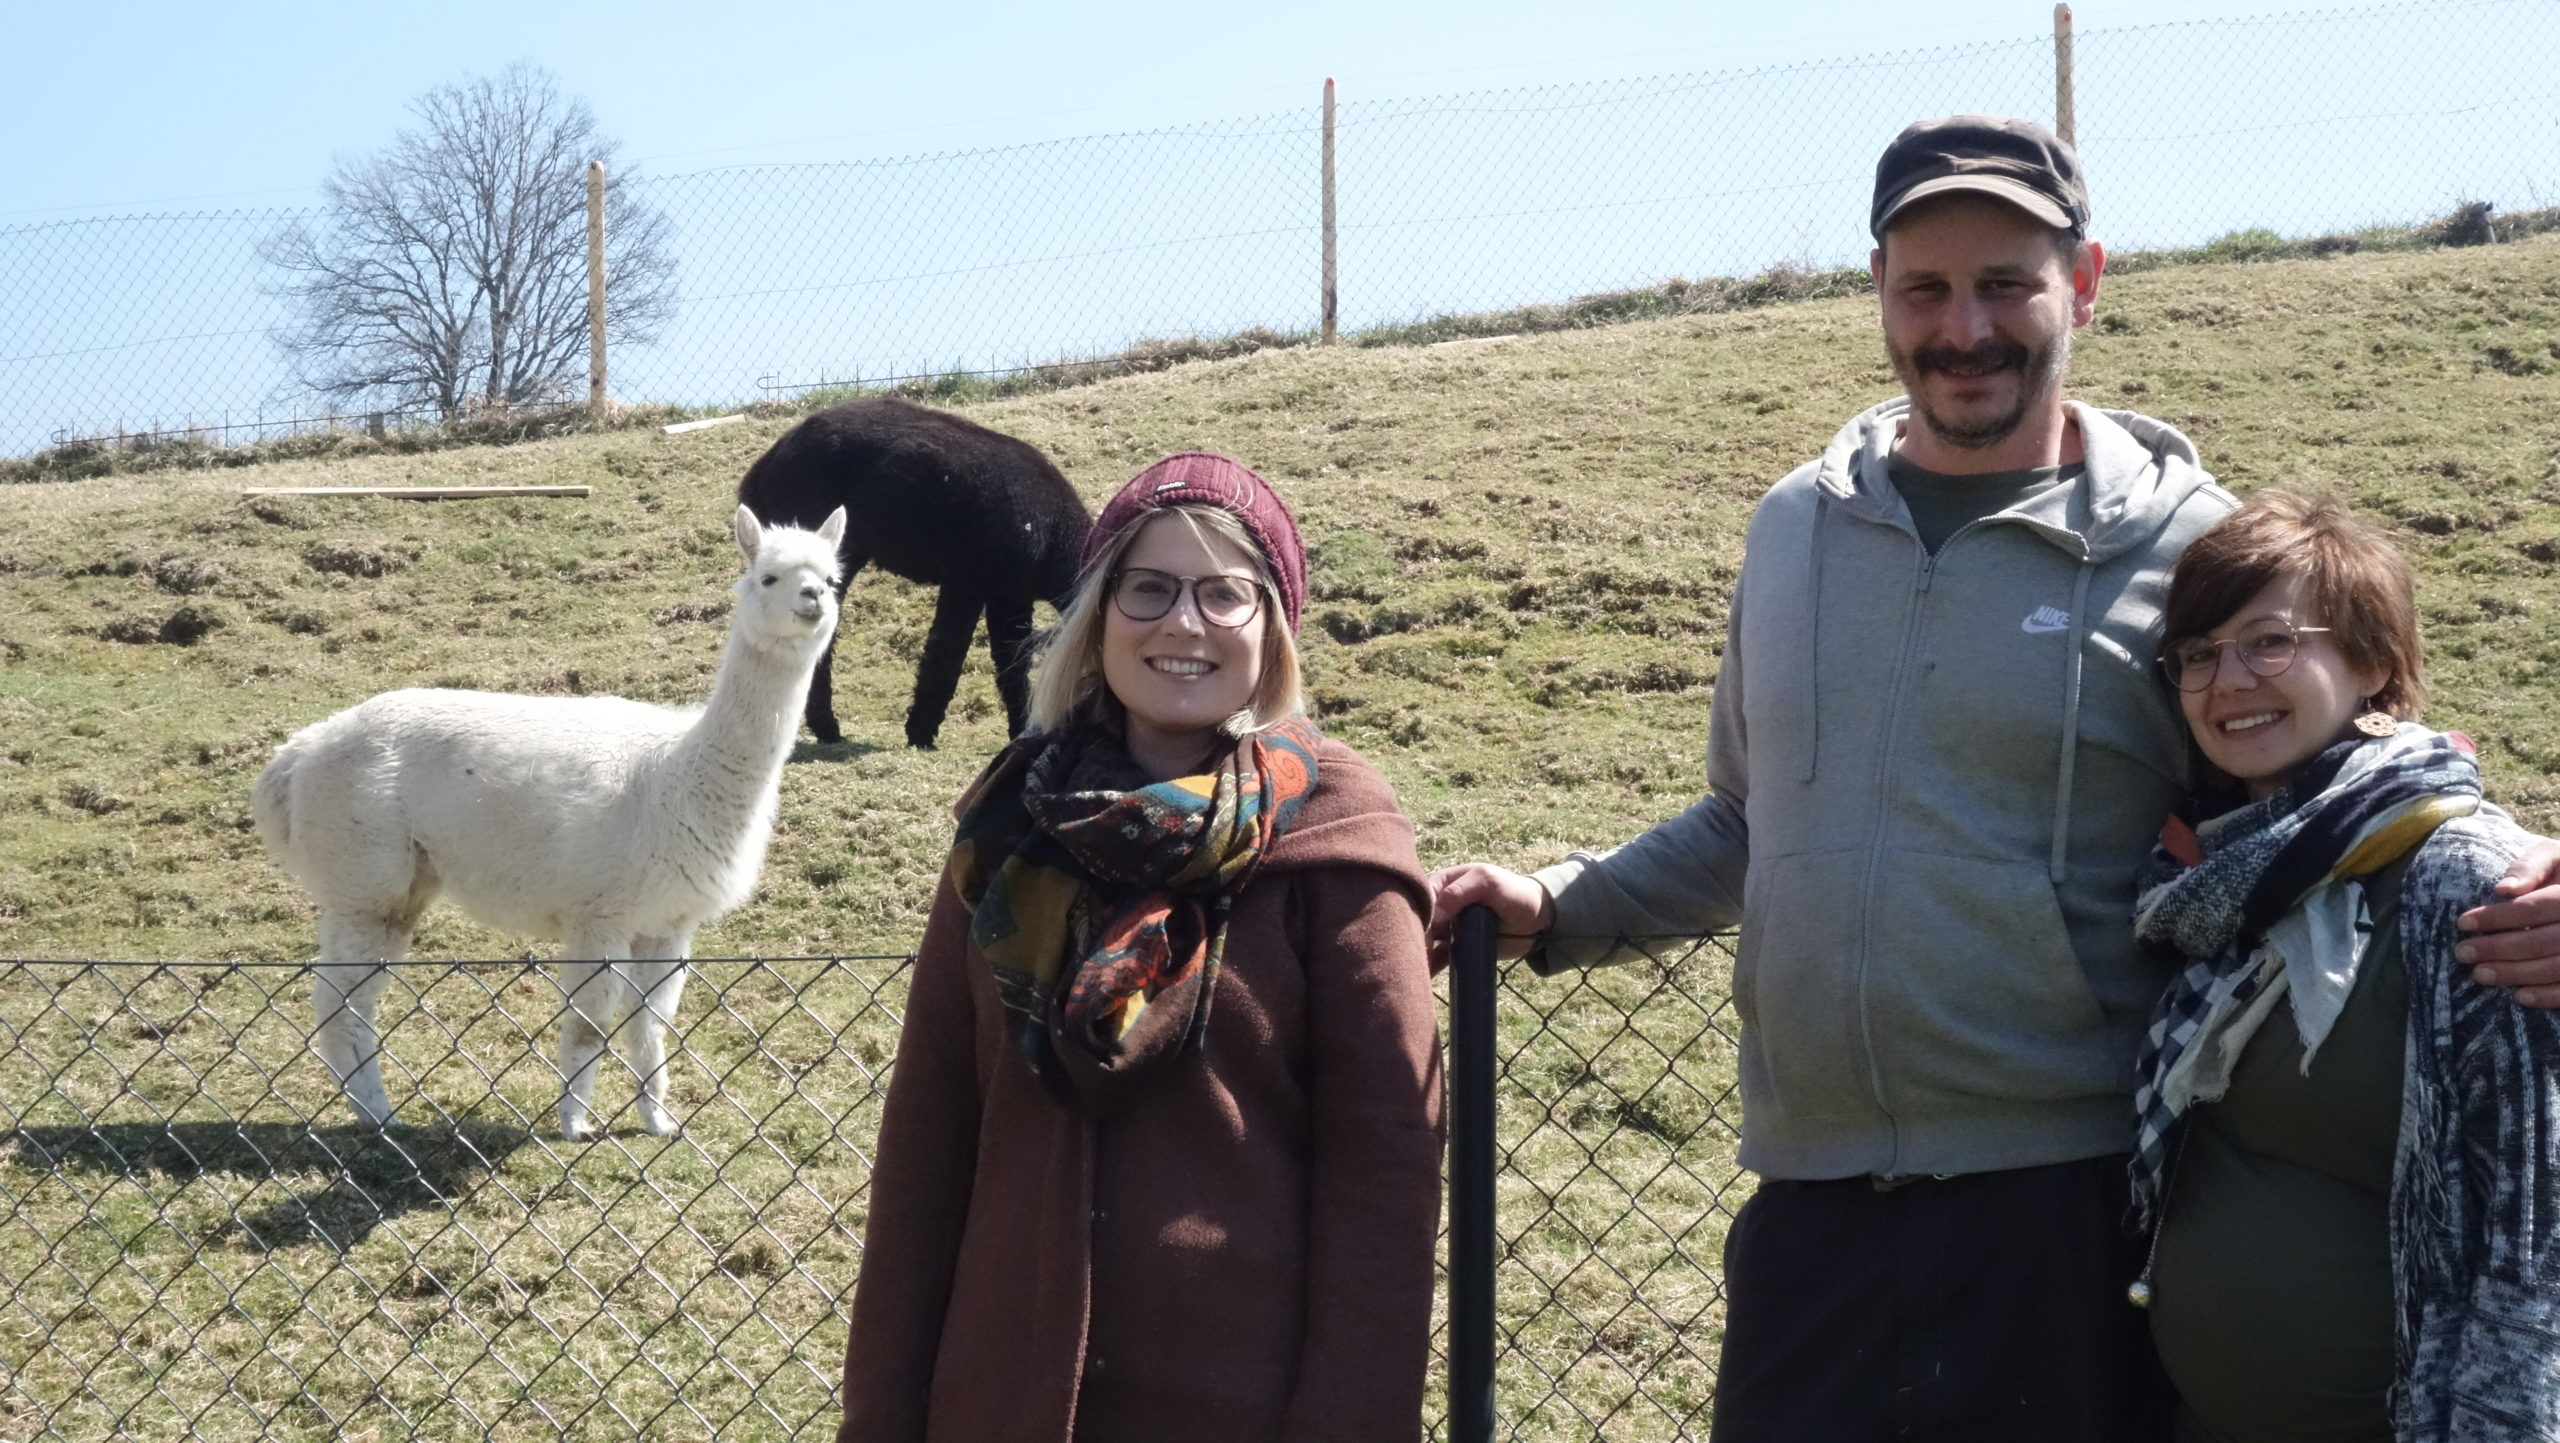 The Optimisticians – Marika, Valentine et Cédric